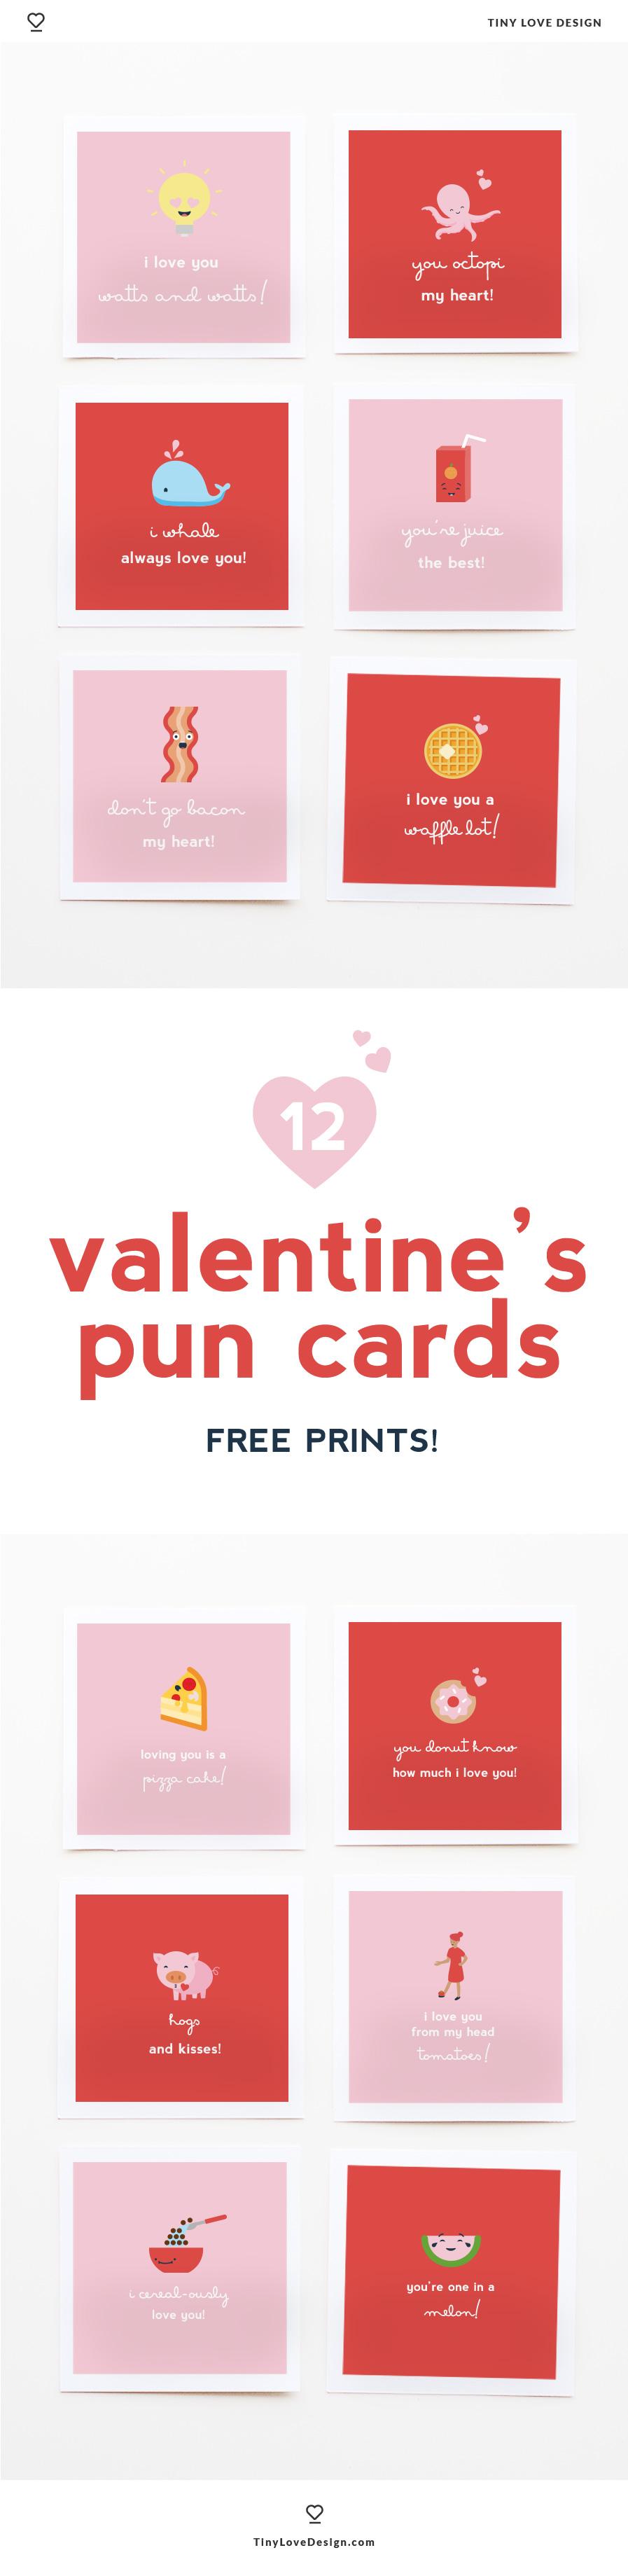 Free Printable Valentine's Pun Cards